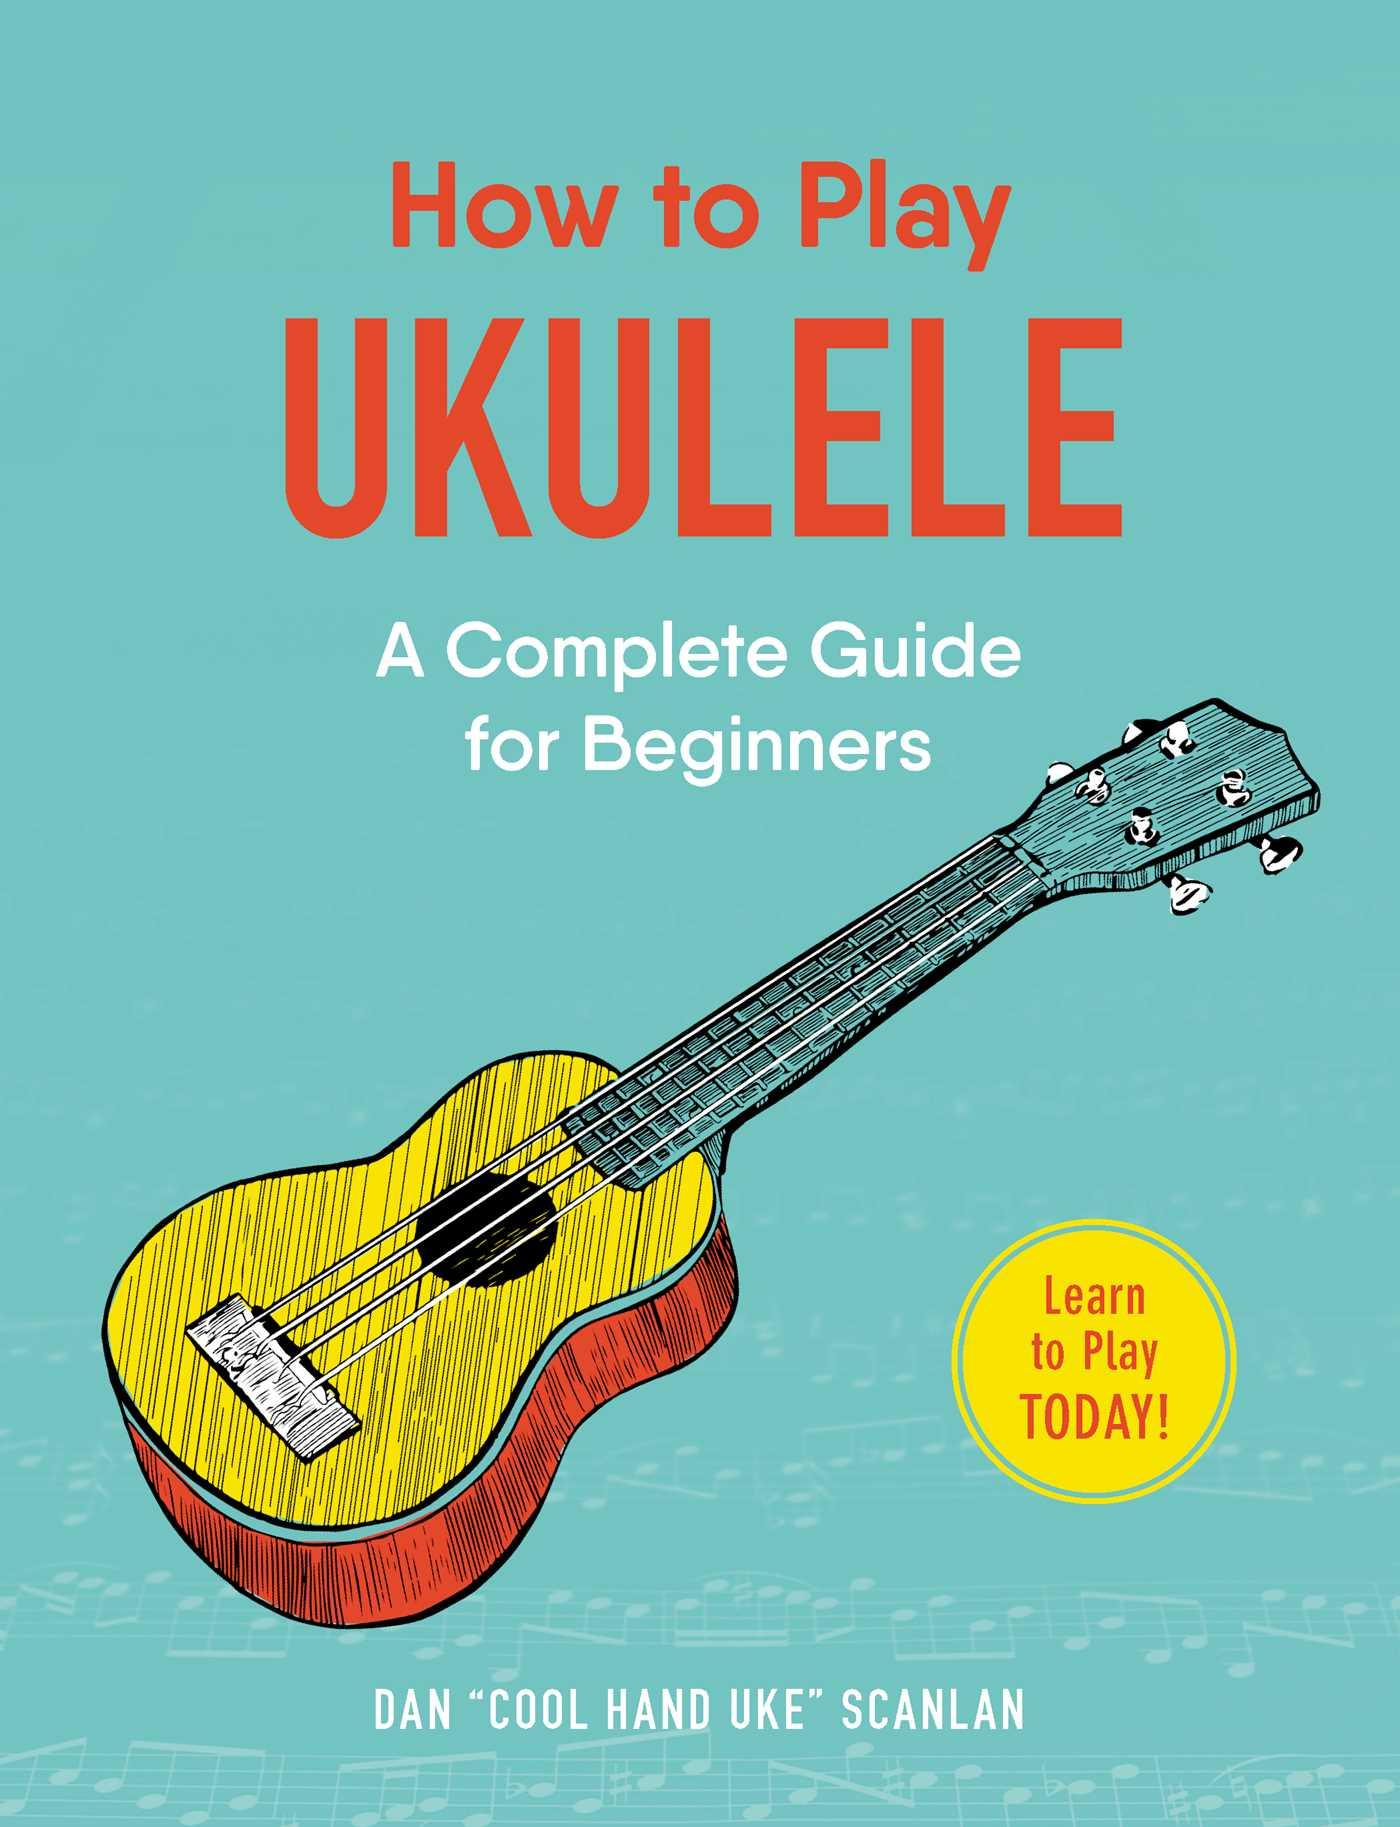 How to play ukulele 9781507207499 hr